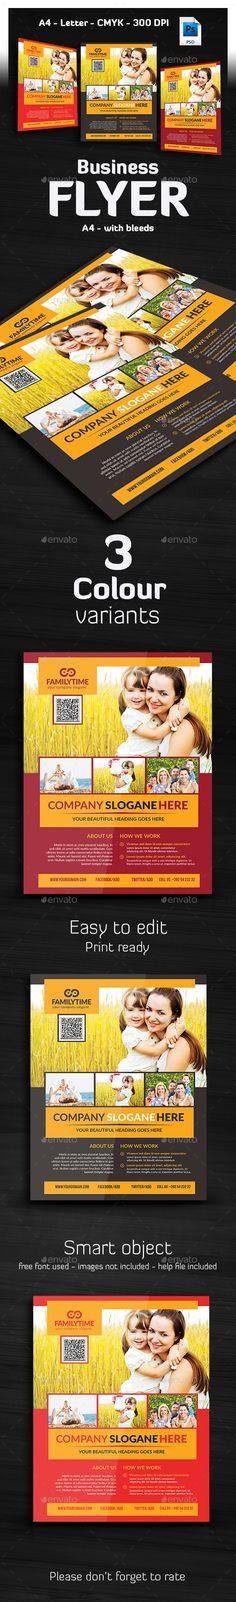 Multipurpose Business Flyer Design Template - Corporate Flyers Template PSD. Download here: https://graphicriver.net/item/multipurpose-business-flyer-/16857789?s_rank=1778&ref=yinkira